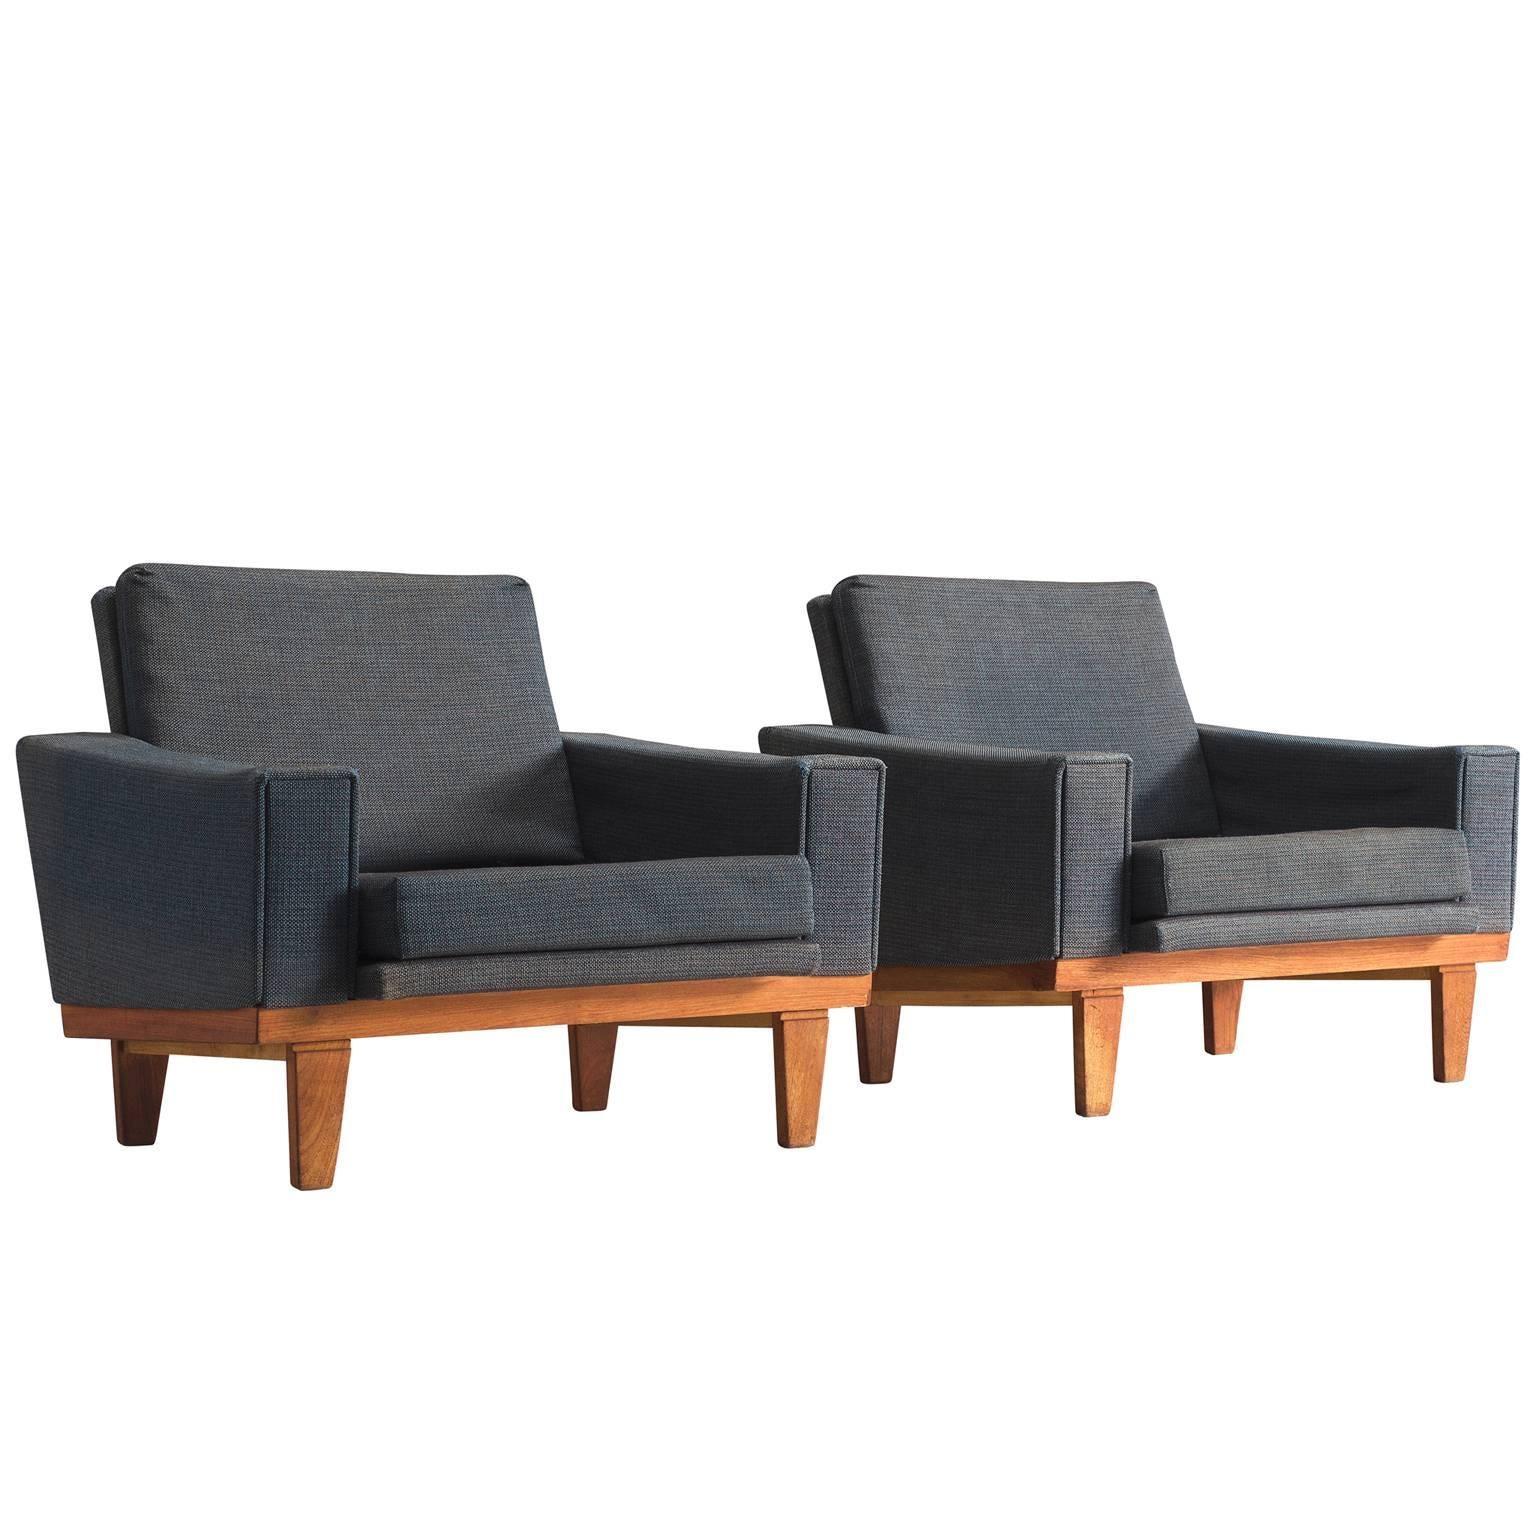 Danish Armchairs with Teak Frame